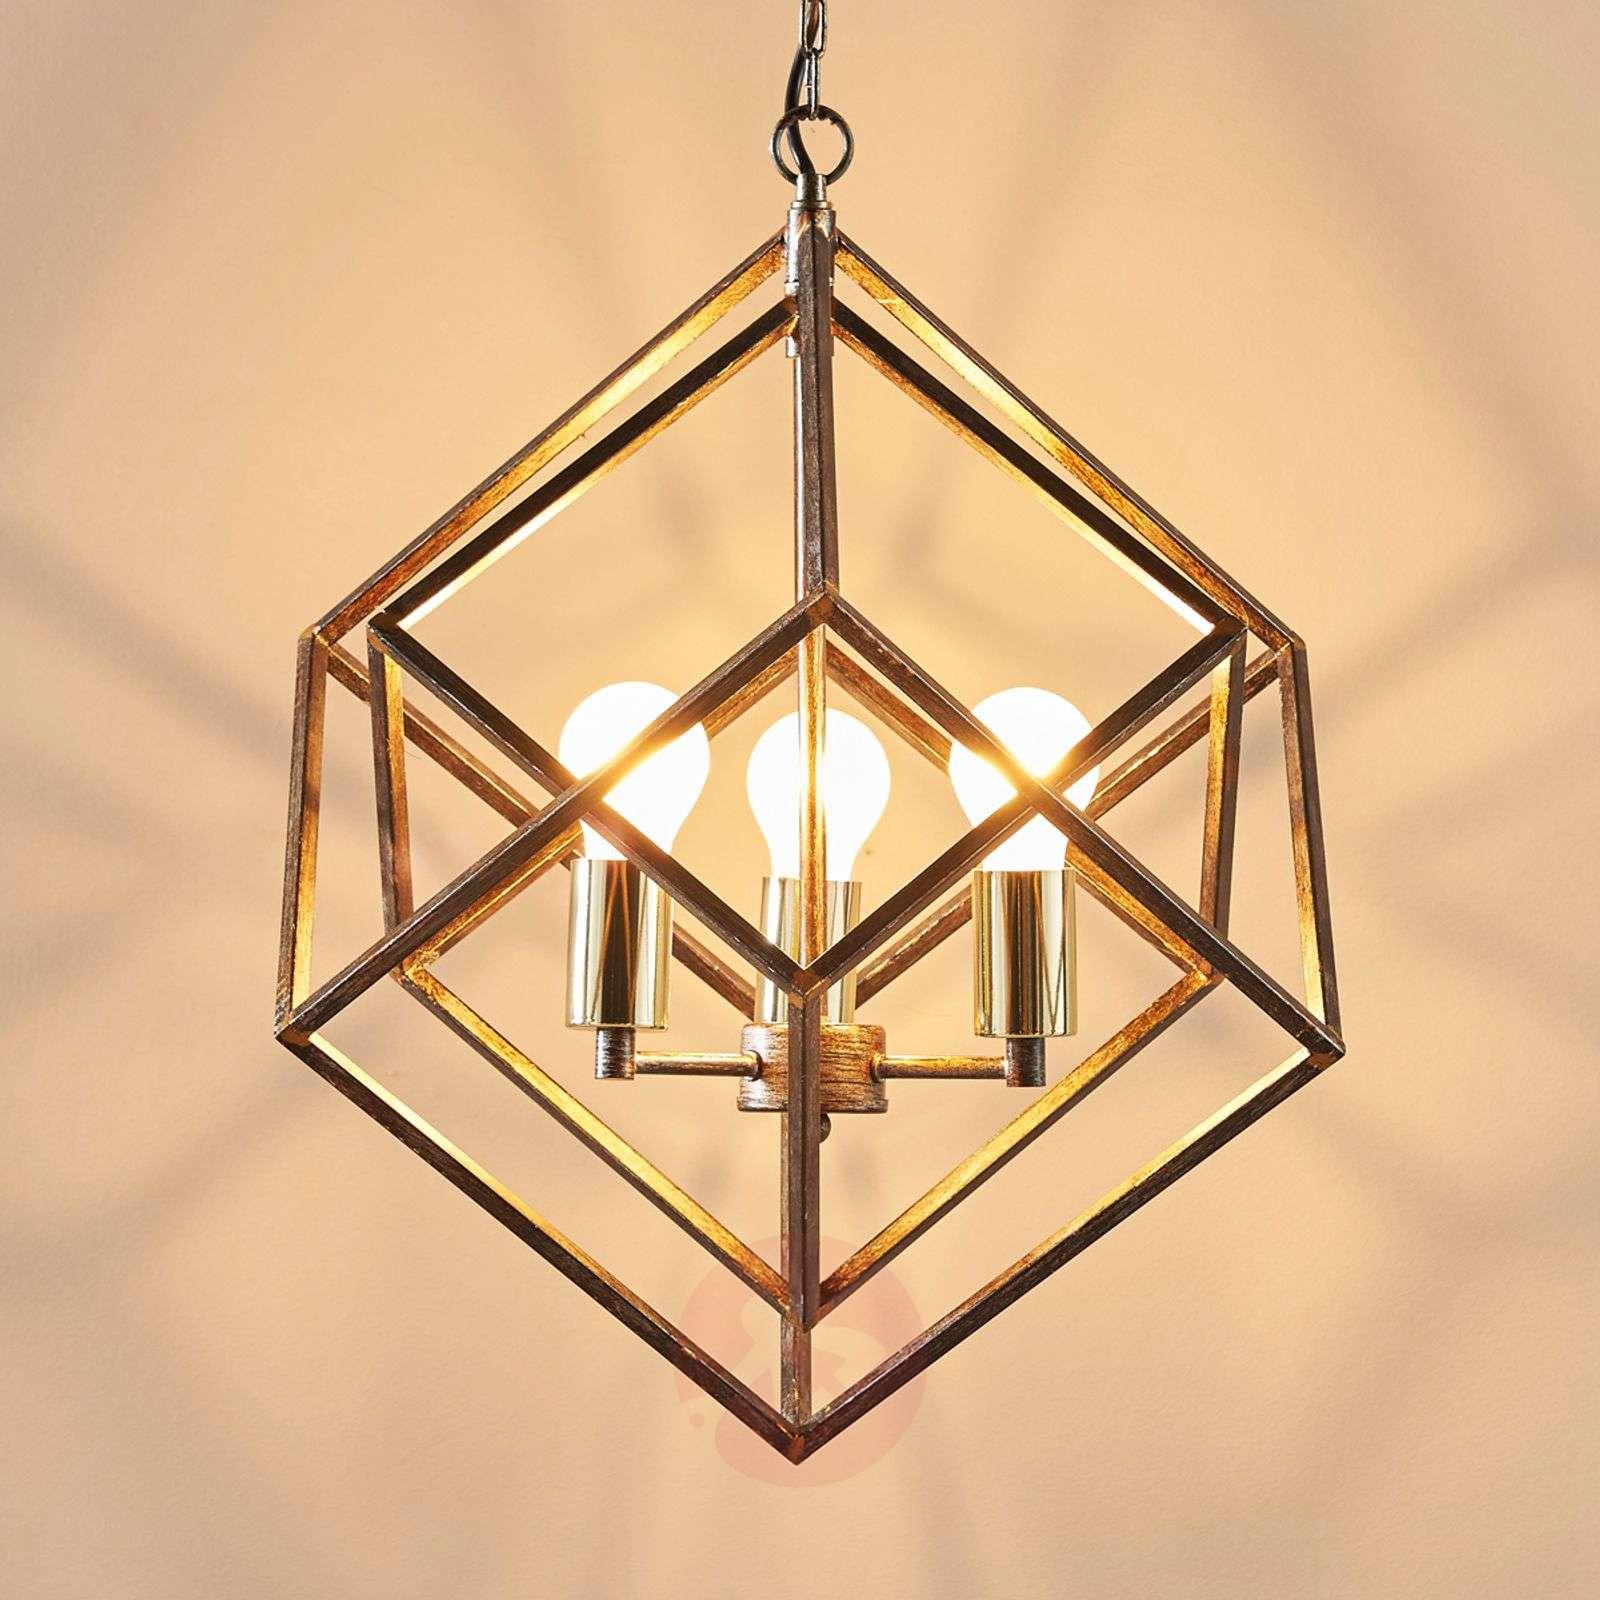 Extraordinary hanging lamp Lorenza-9620906-03